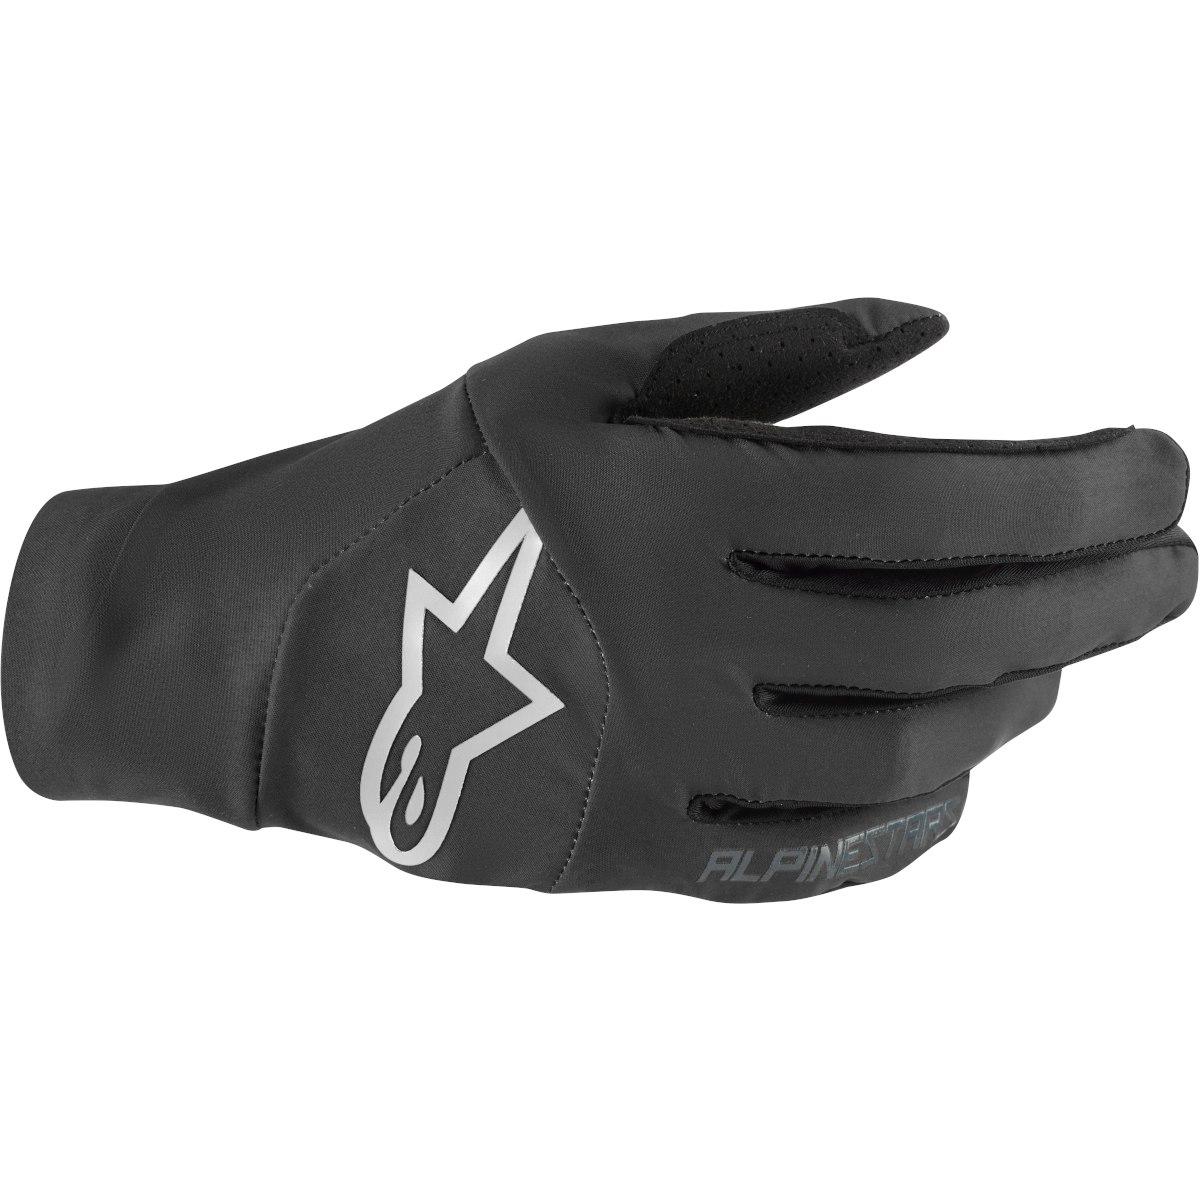 Alpinestars Drop 4.0 Glove Full Finger - black